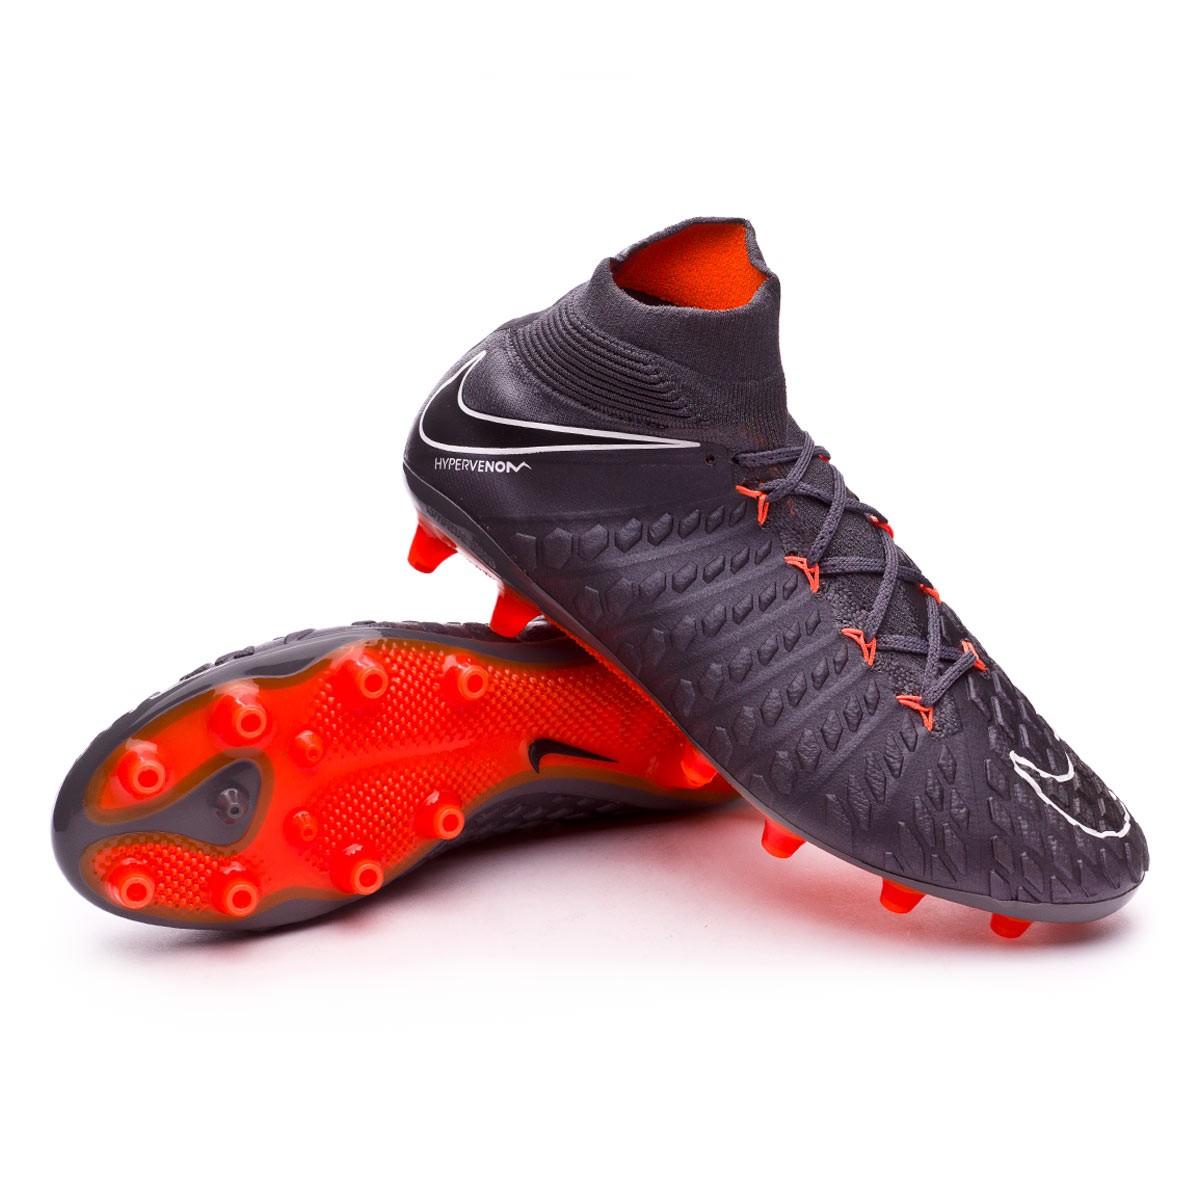 purchase cheap 83fab 5c638 Nike Hypervenom Phantom III Elite DF AG-Pro Football Boots